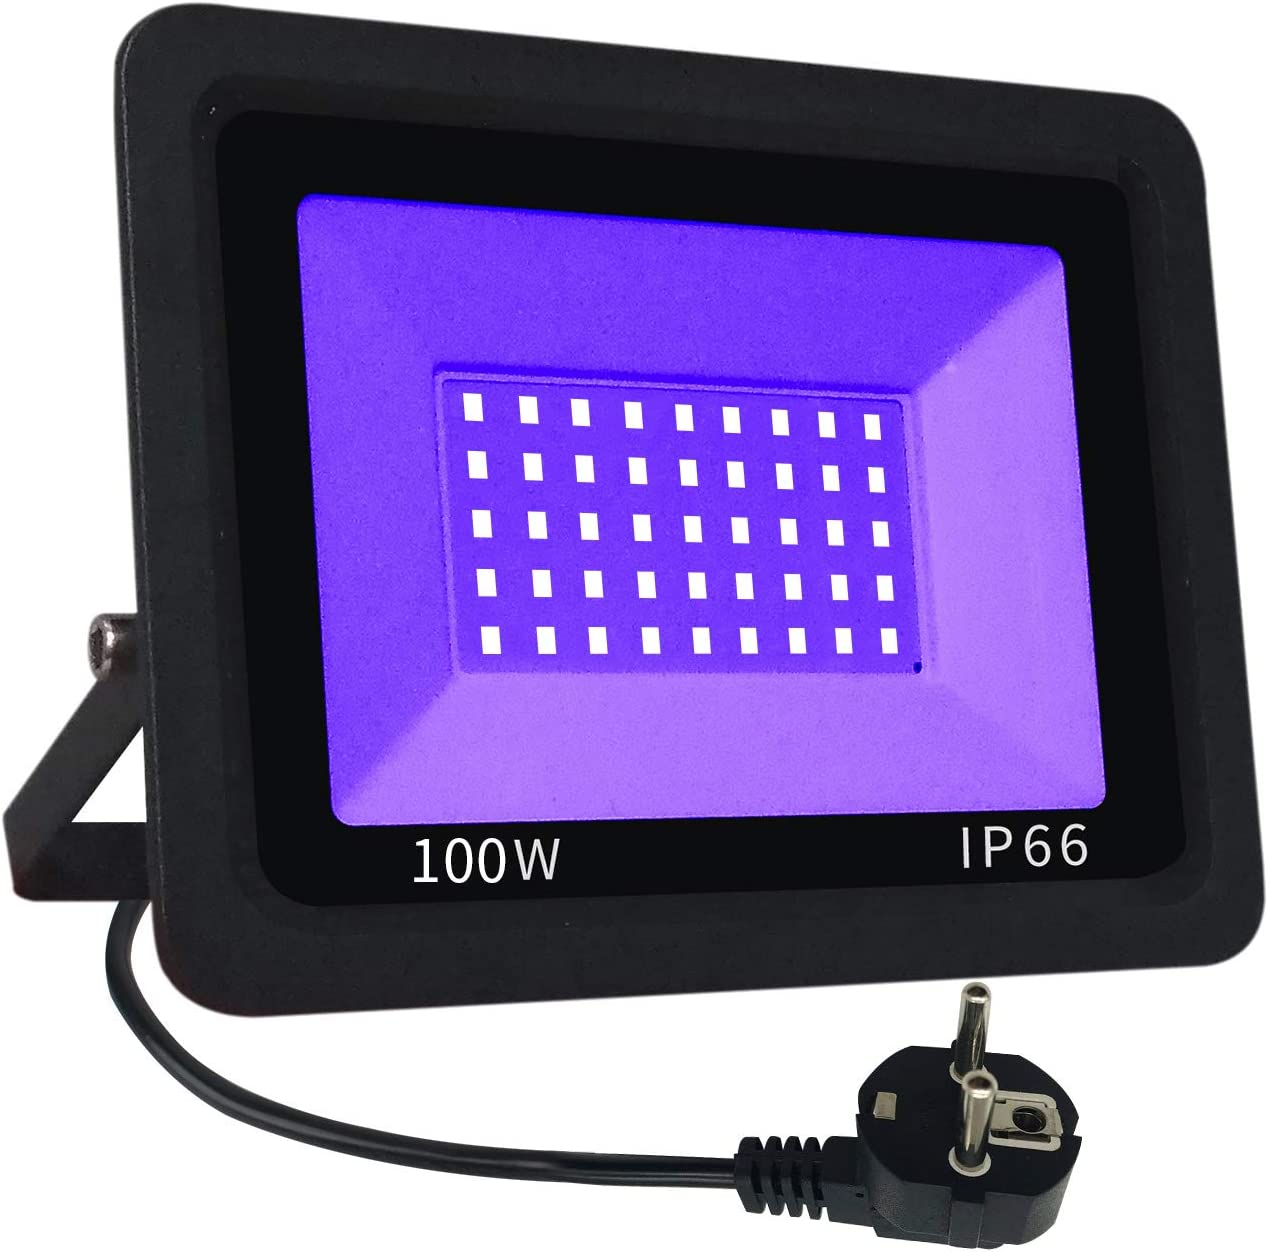 UV Luz negra LED Eleganted 100W LED decorativa violeta Etapa,IP65 Impermeable UV-A 395-400nm